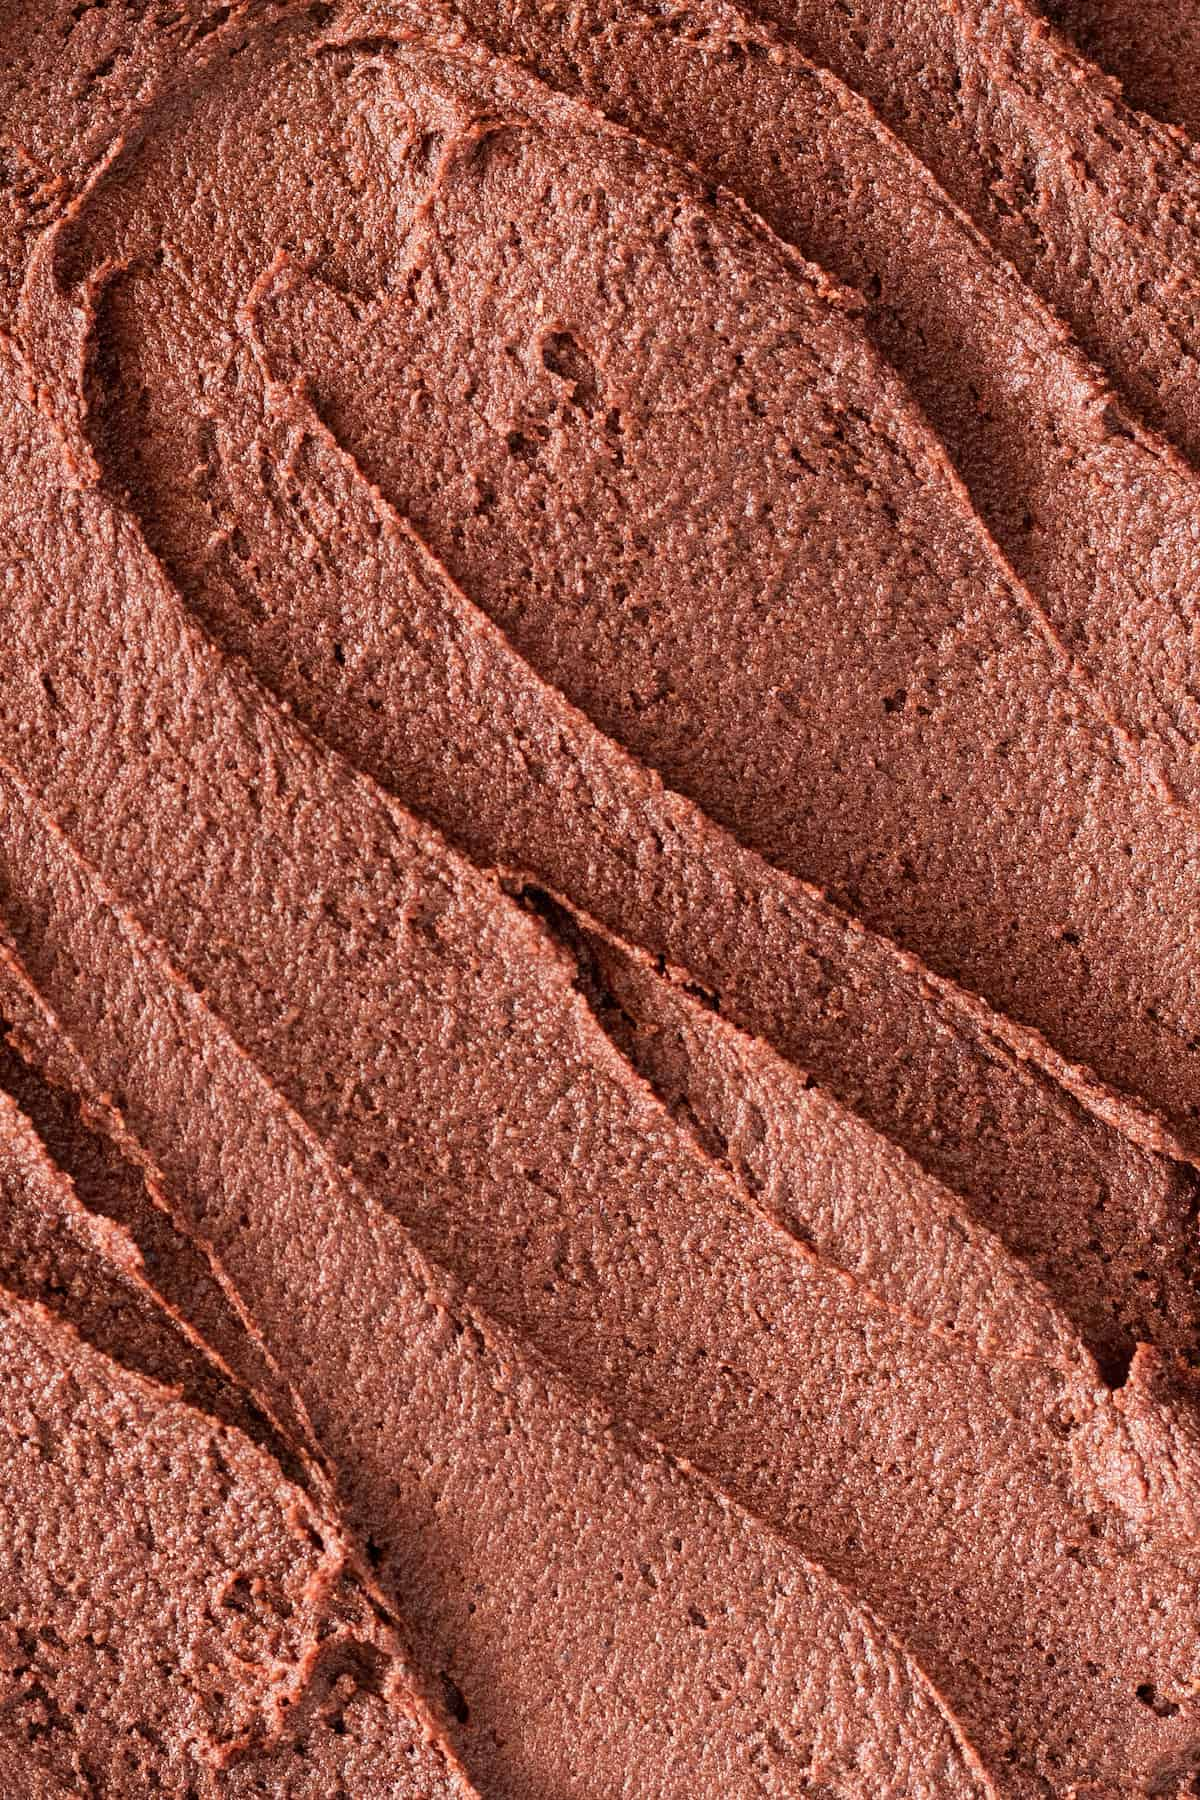 A Close-Up Shot of Homemade Chocolate Buttercream